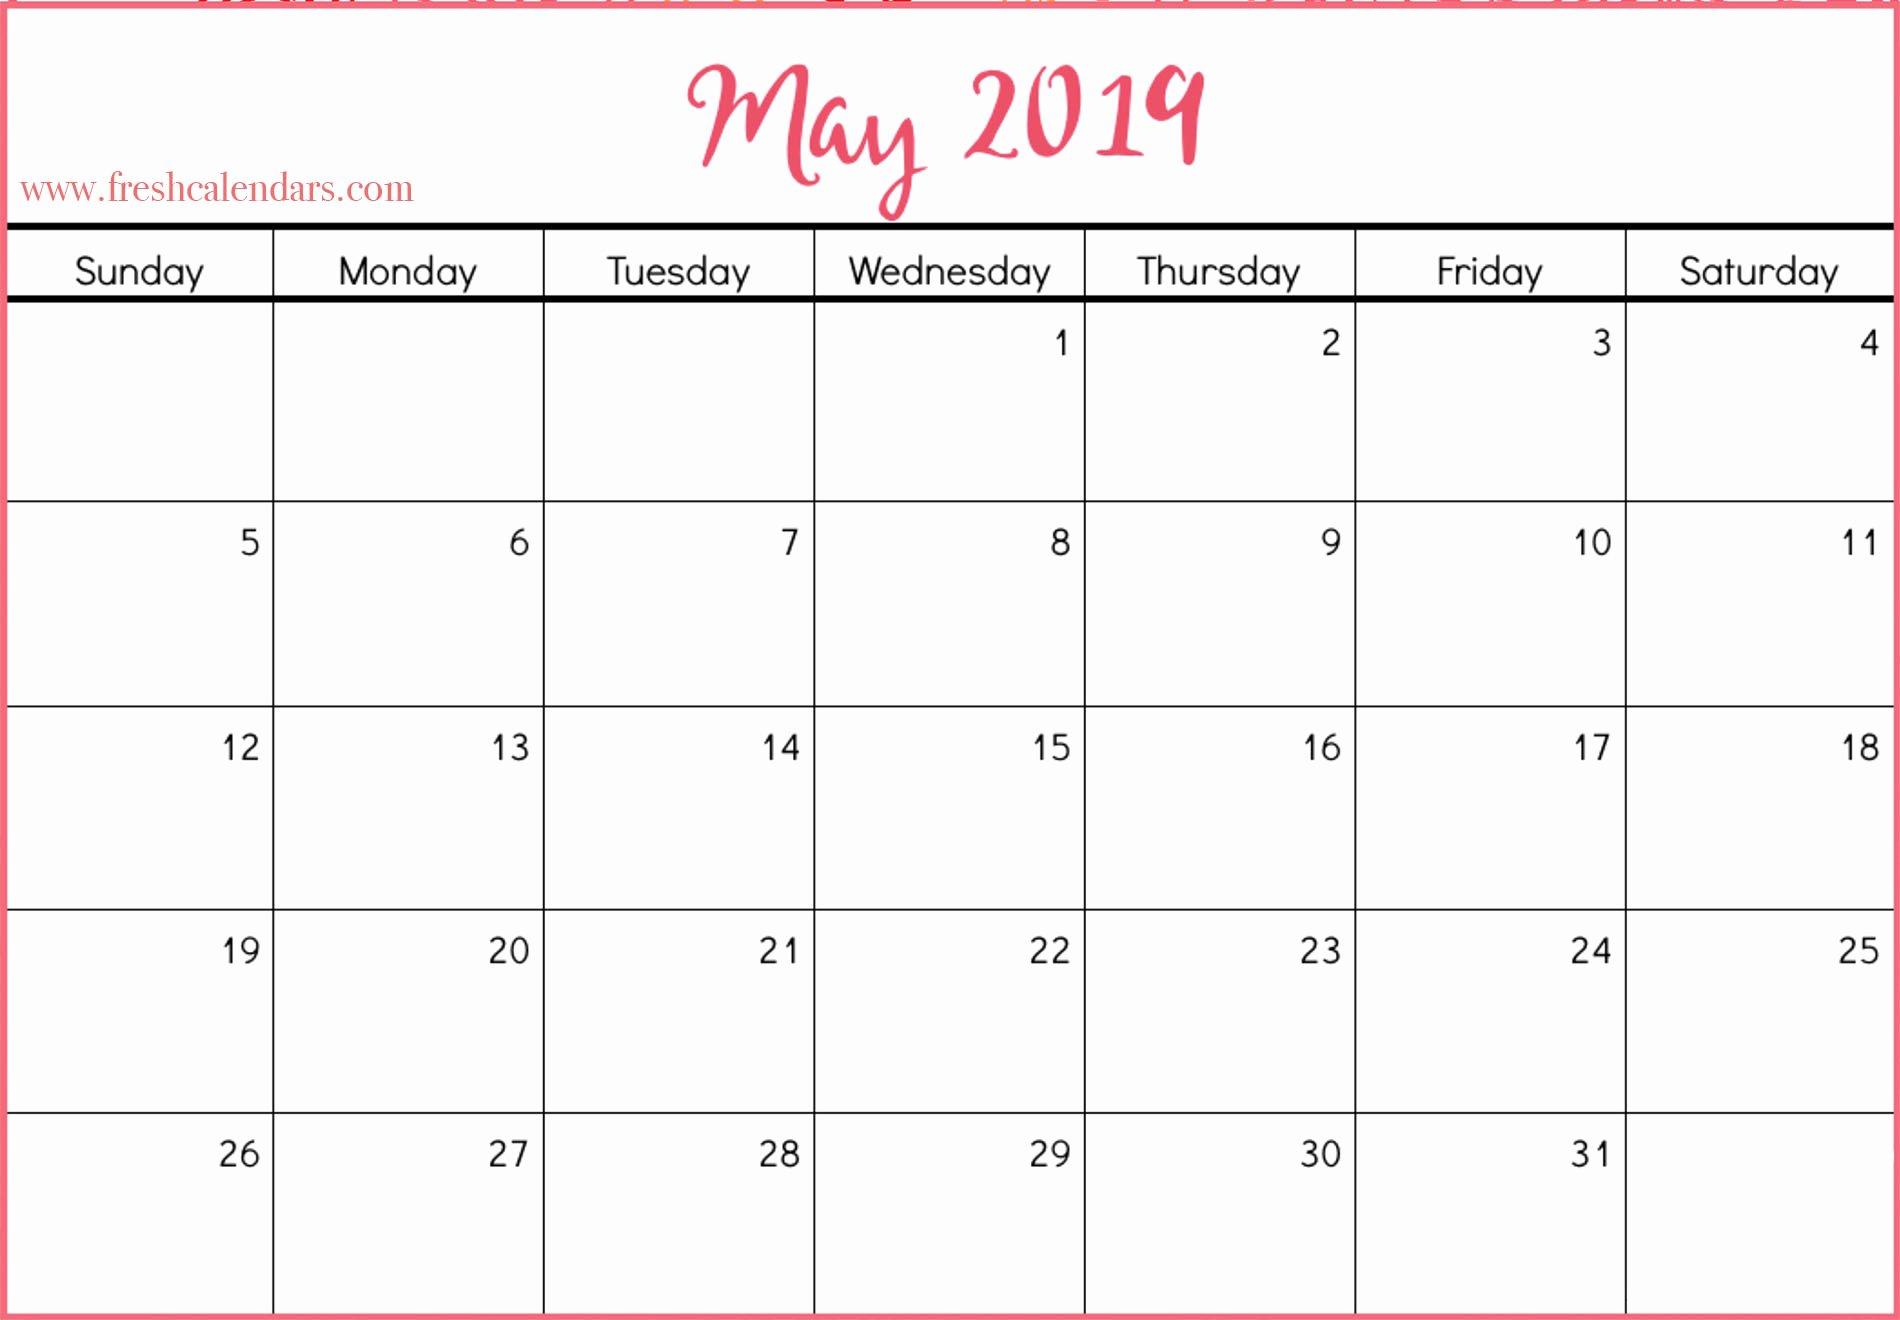 Microsoft Calendar Templates 2019 Unique May 2019 Calendar Printable